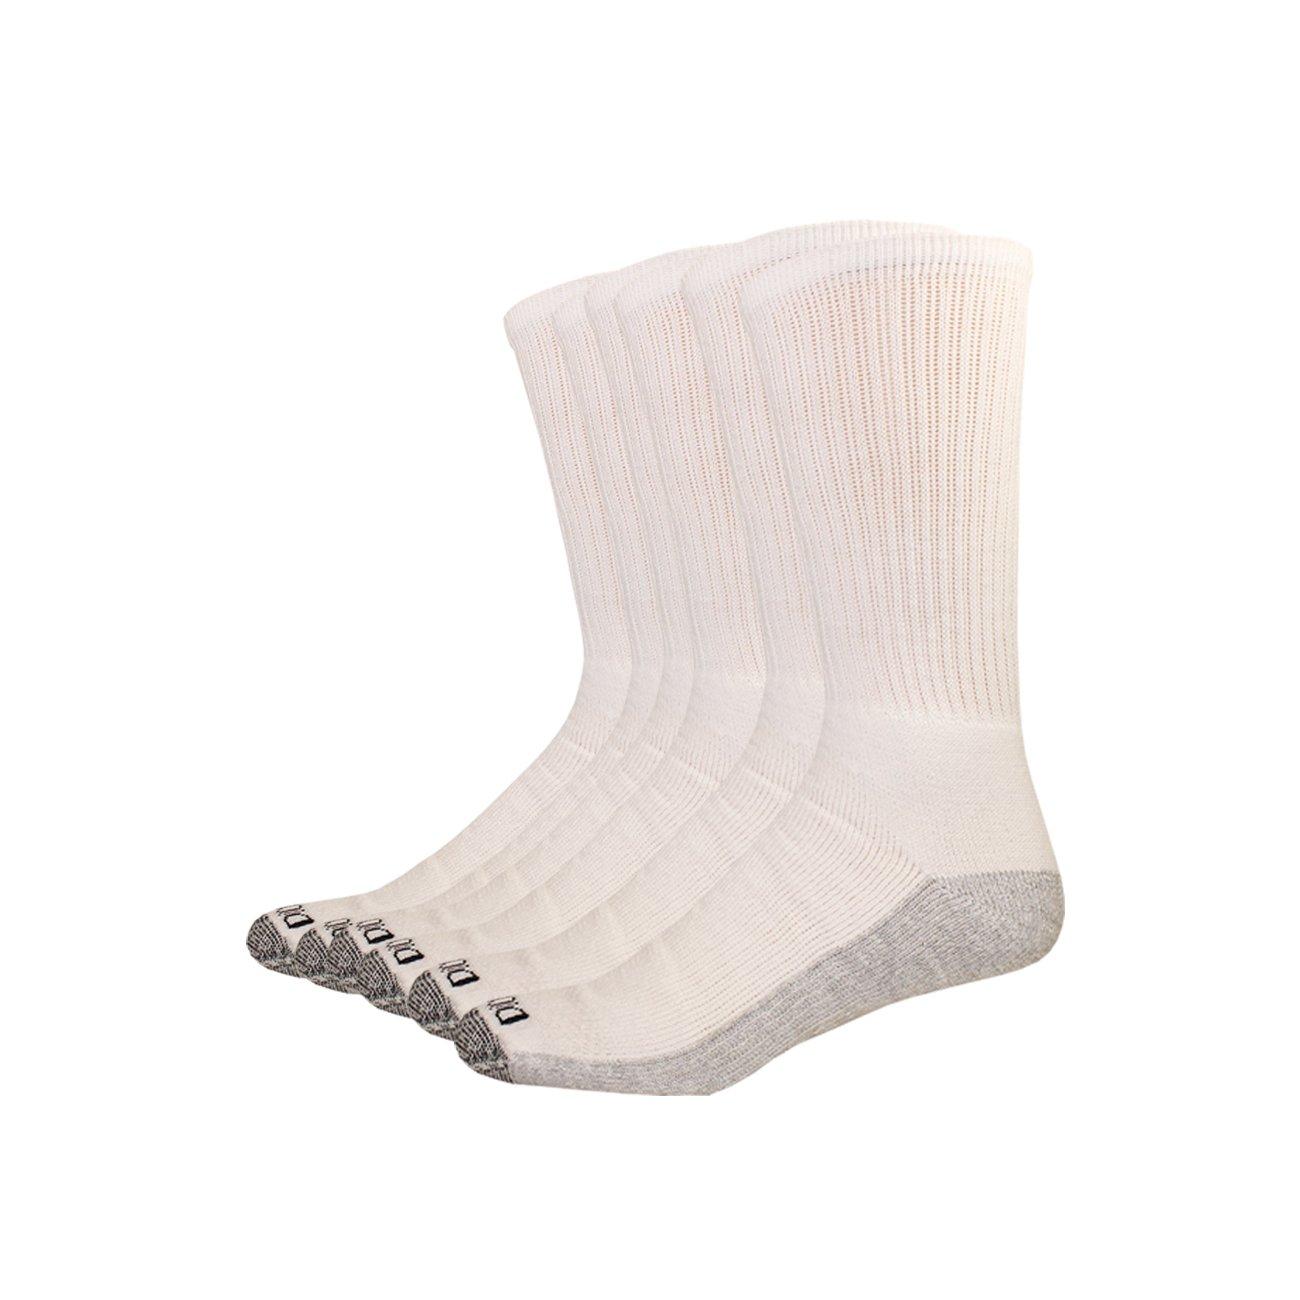 Dickies Men's Multi-Pack Dri-Tech Moisture Control Crew Socks, White 6 Pack, Sock Size: 10-13/Shoe Size: 6-12